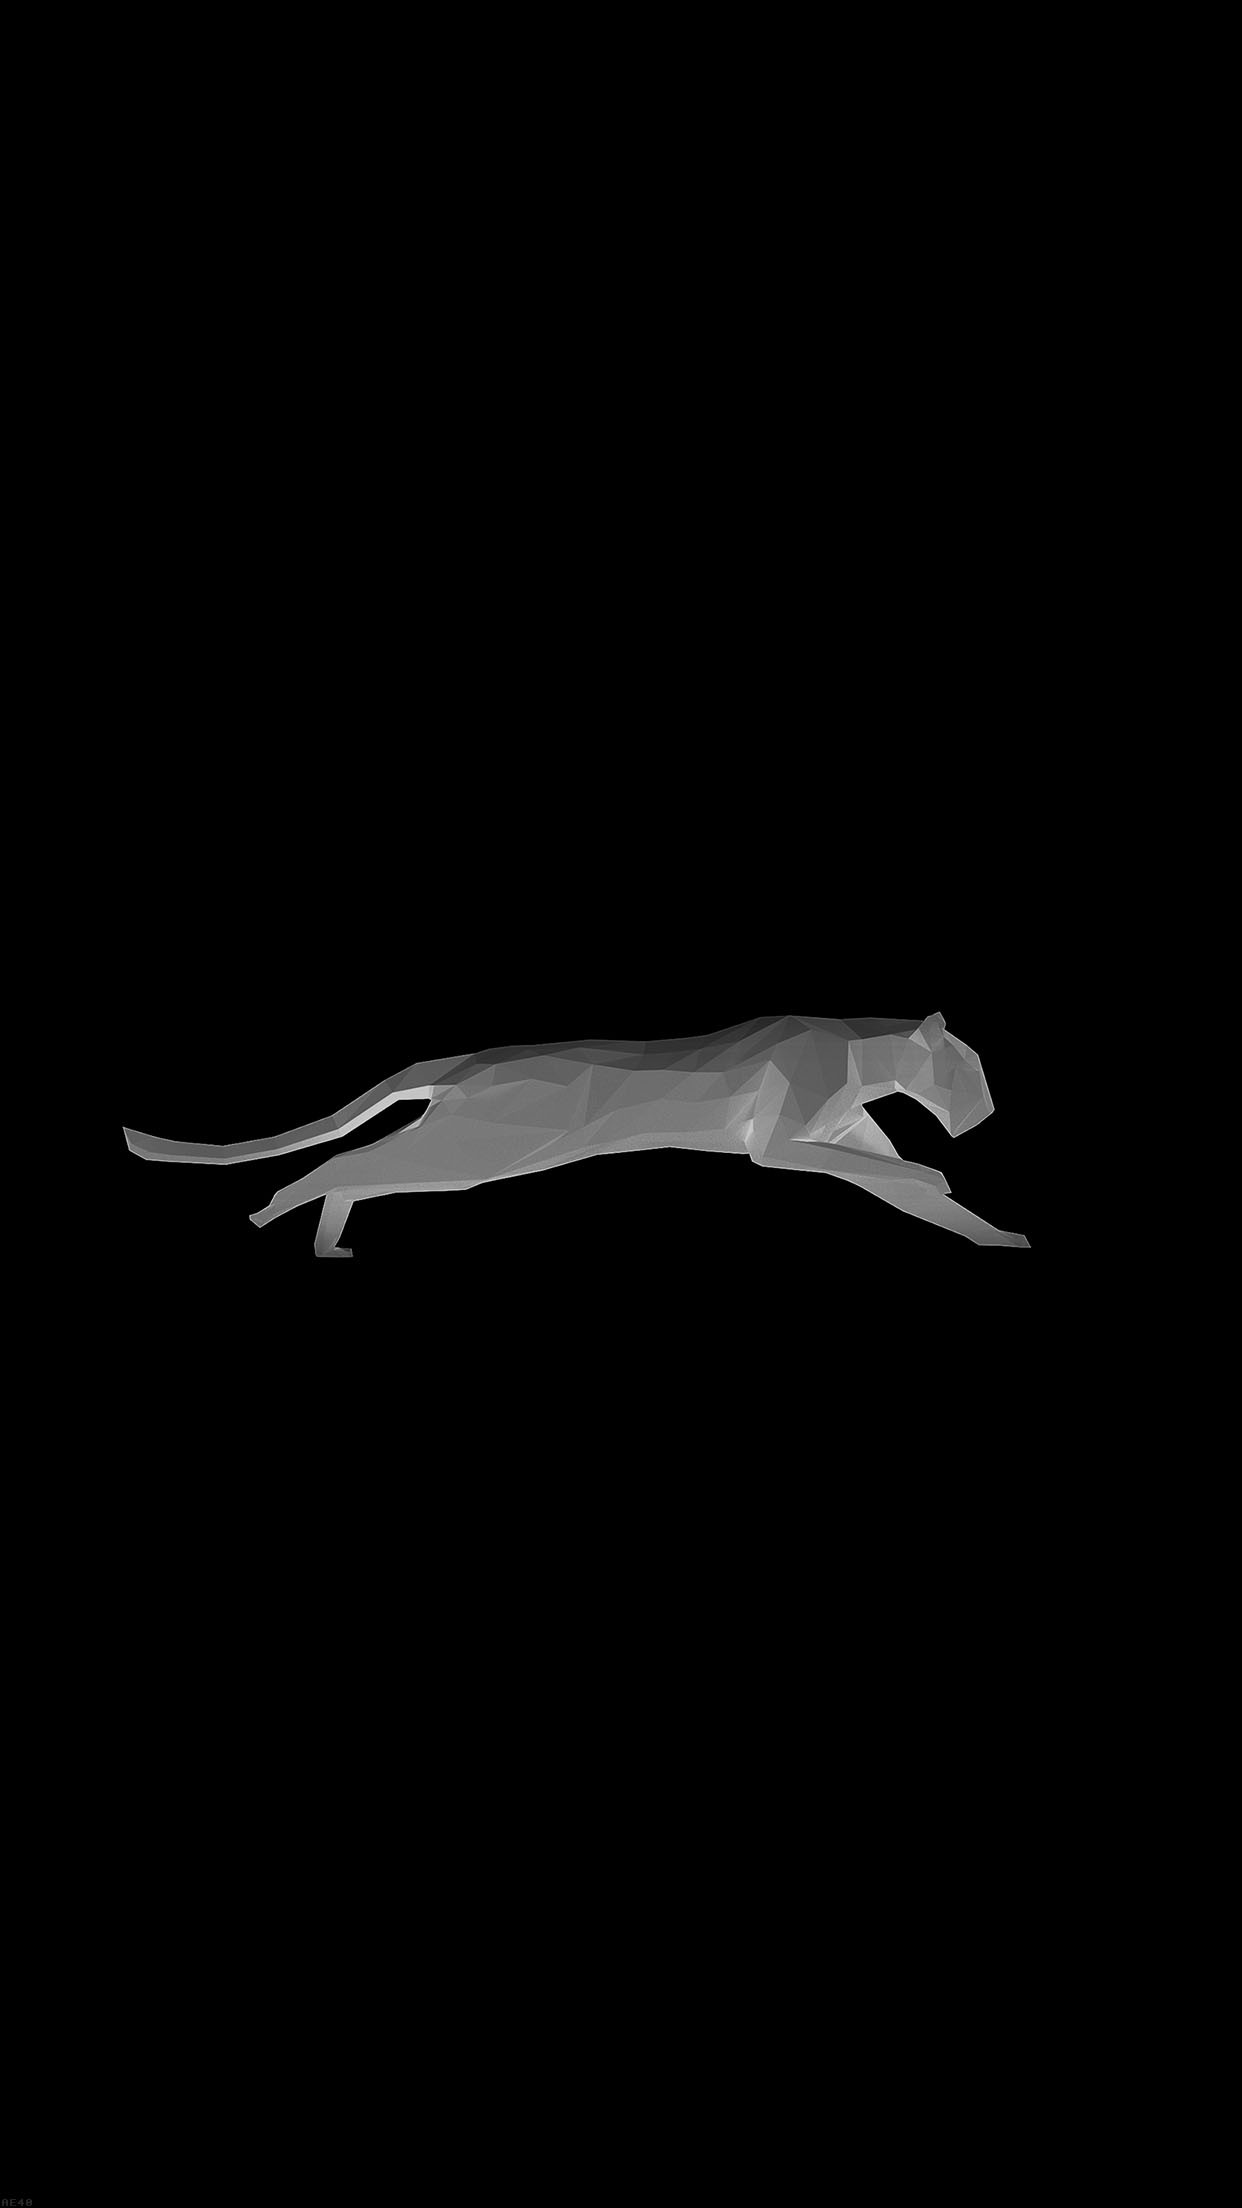 Running Puma Black Illust Art Minimal #iPhone #6 #wallpaper